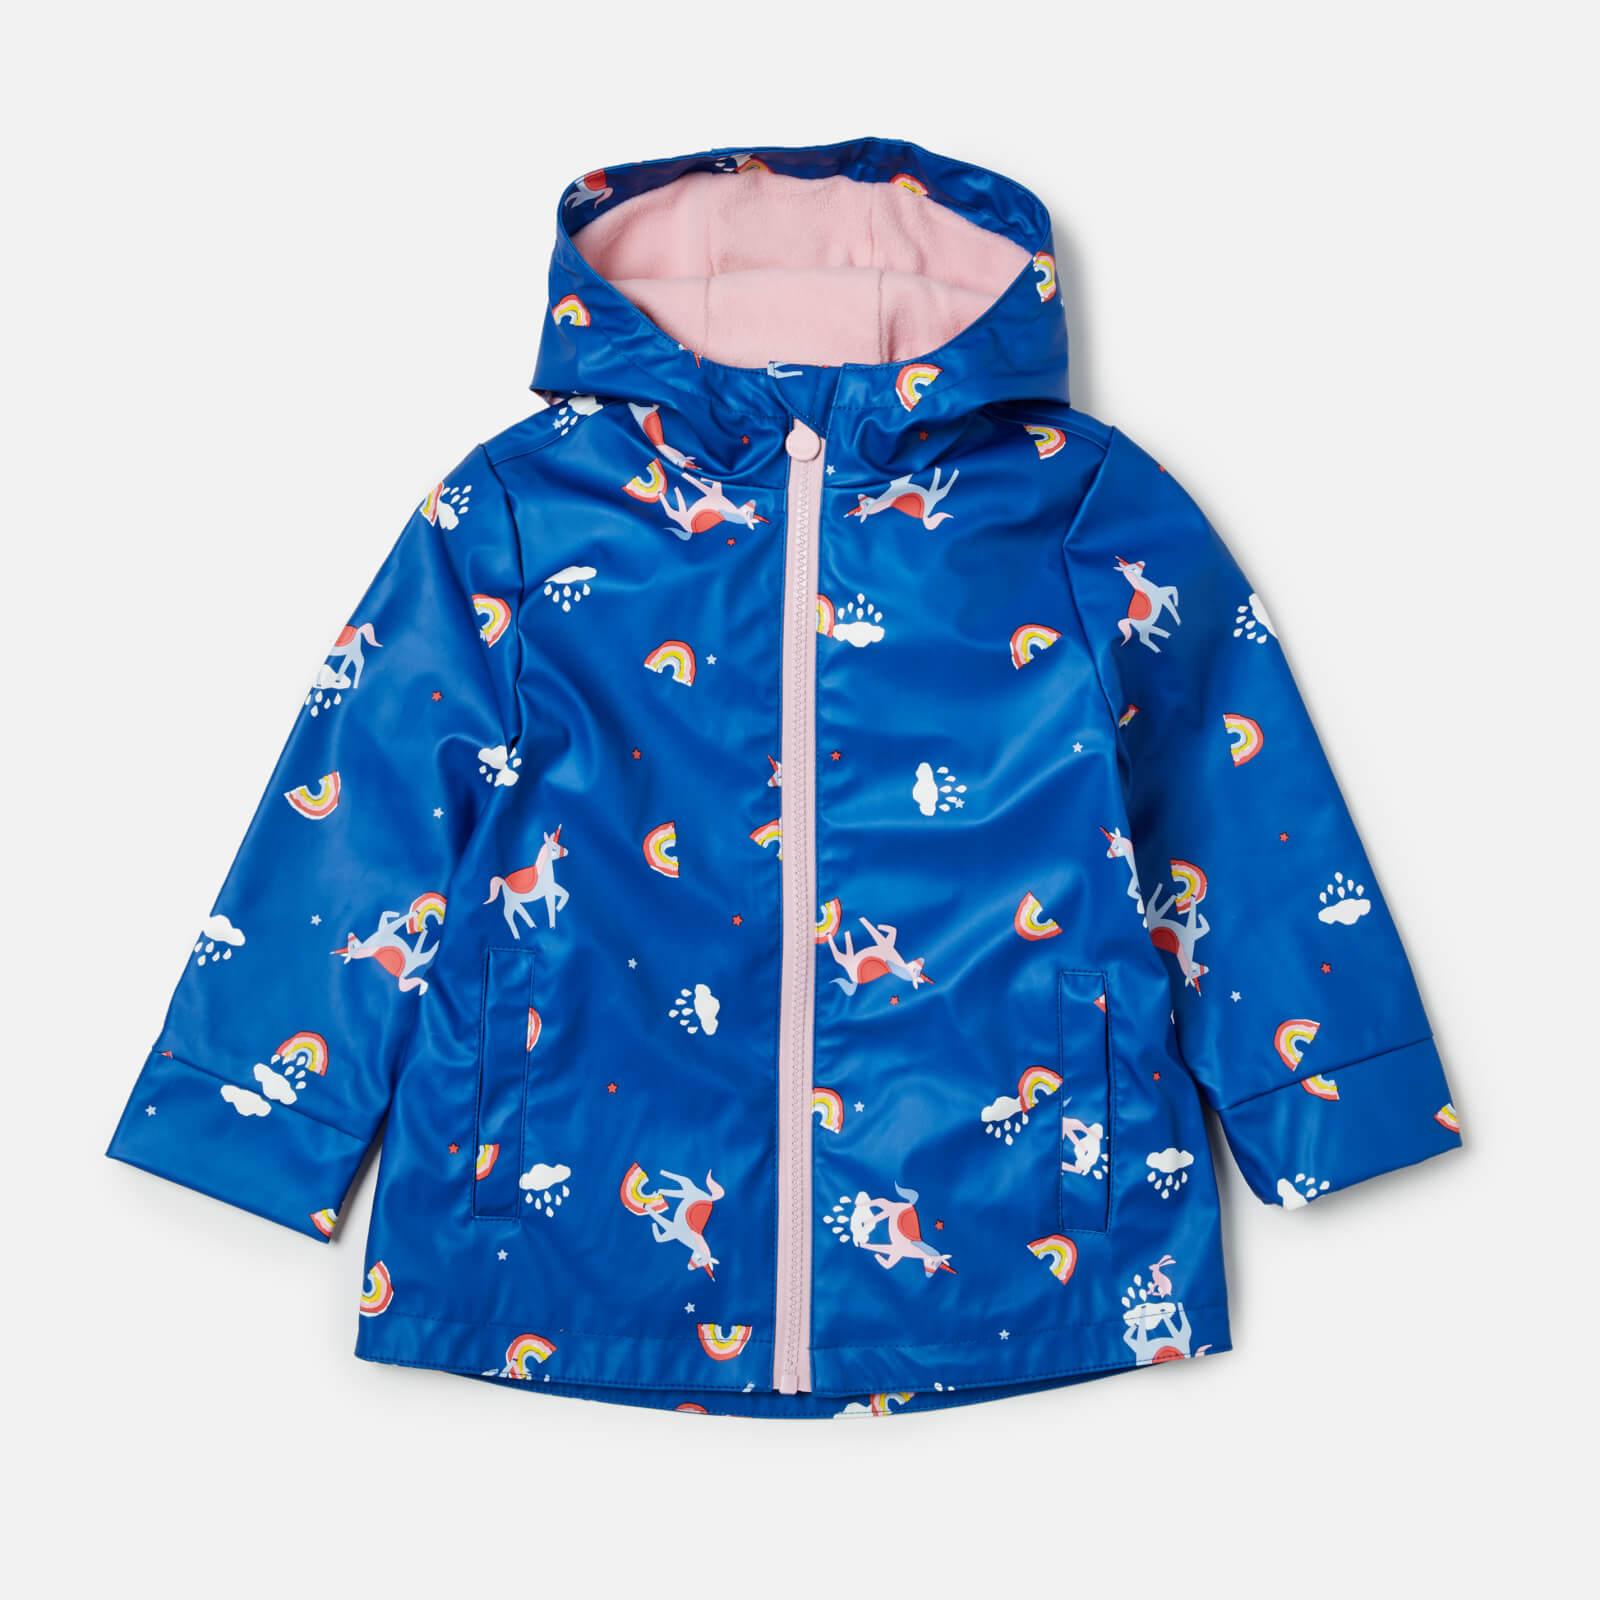 Joules Girls' Raindance Waterproof Coat - Blue Unicorn Clouds - 4 Years - Blue